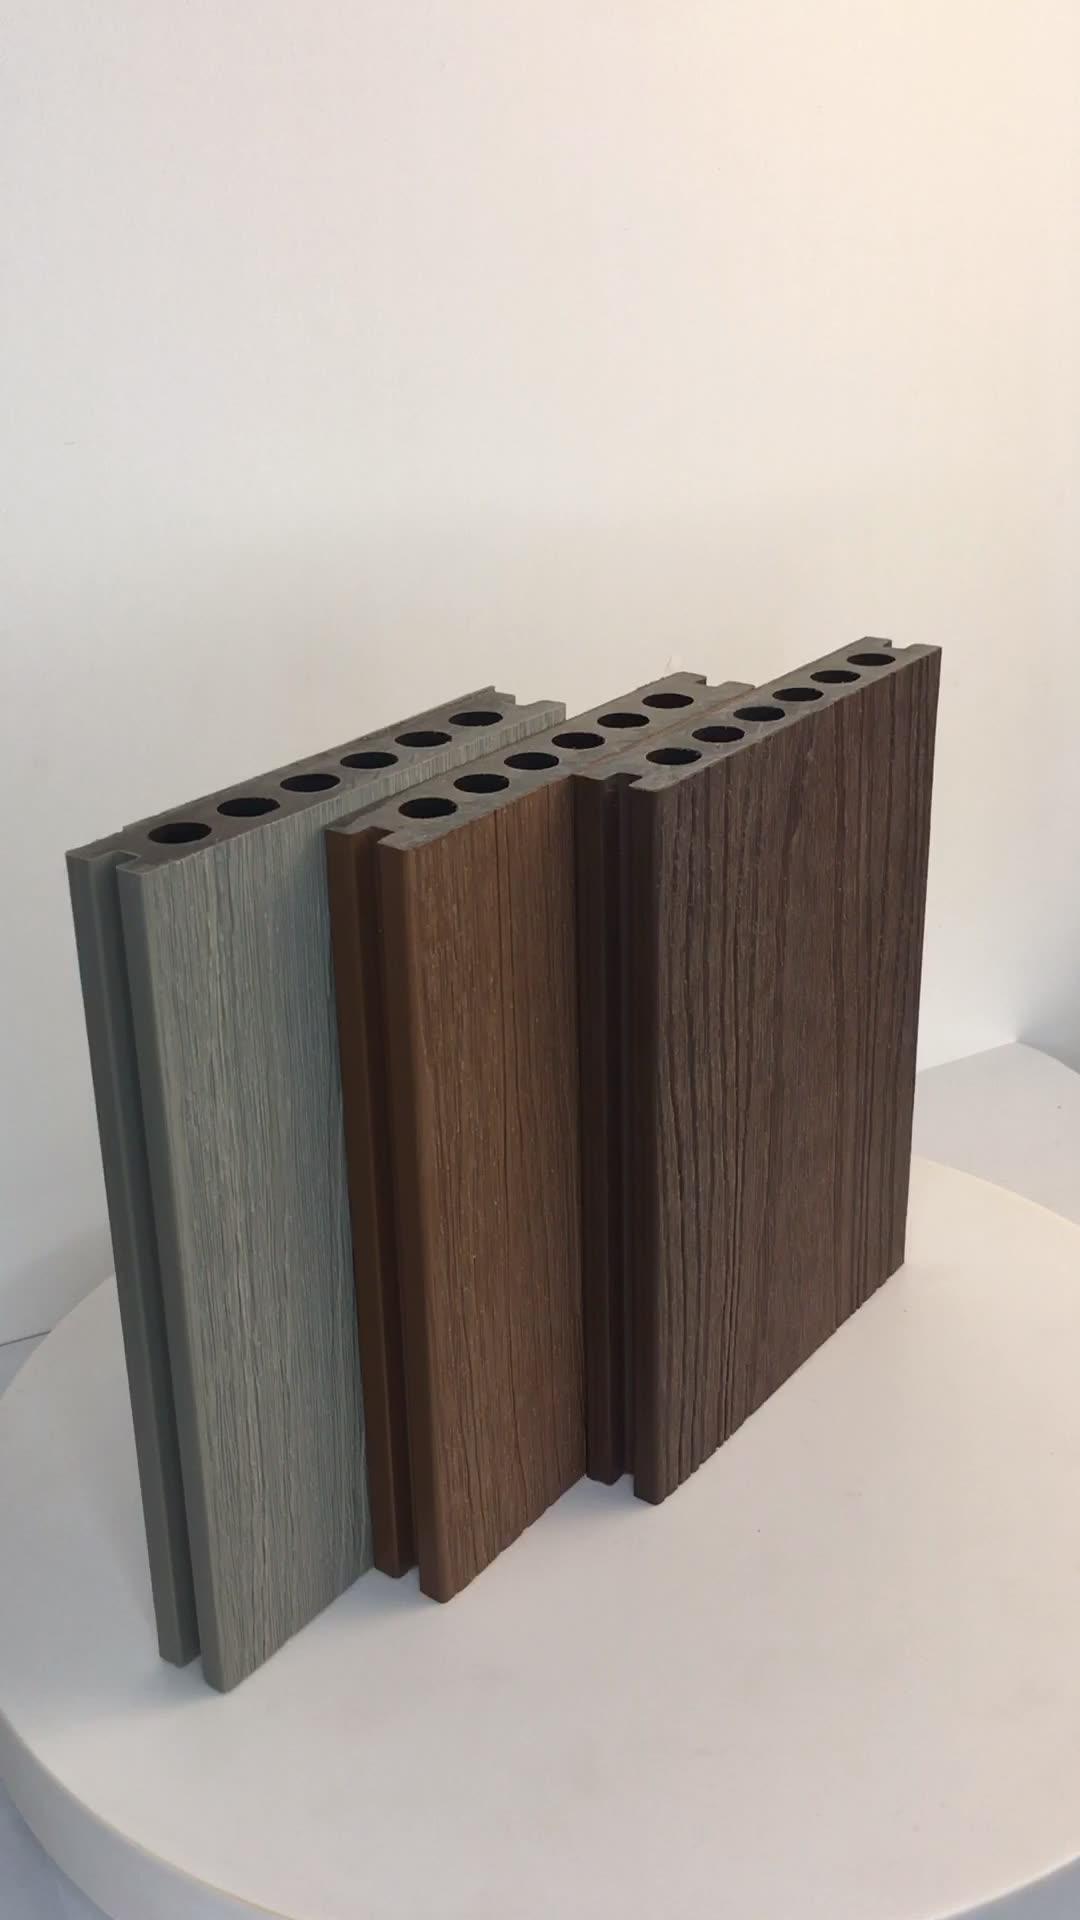 RUCCA Engineered Flooring 138*23mm Outdoor Wood Plastic Composite WPC Decking